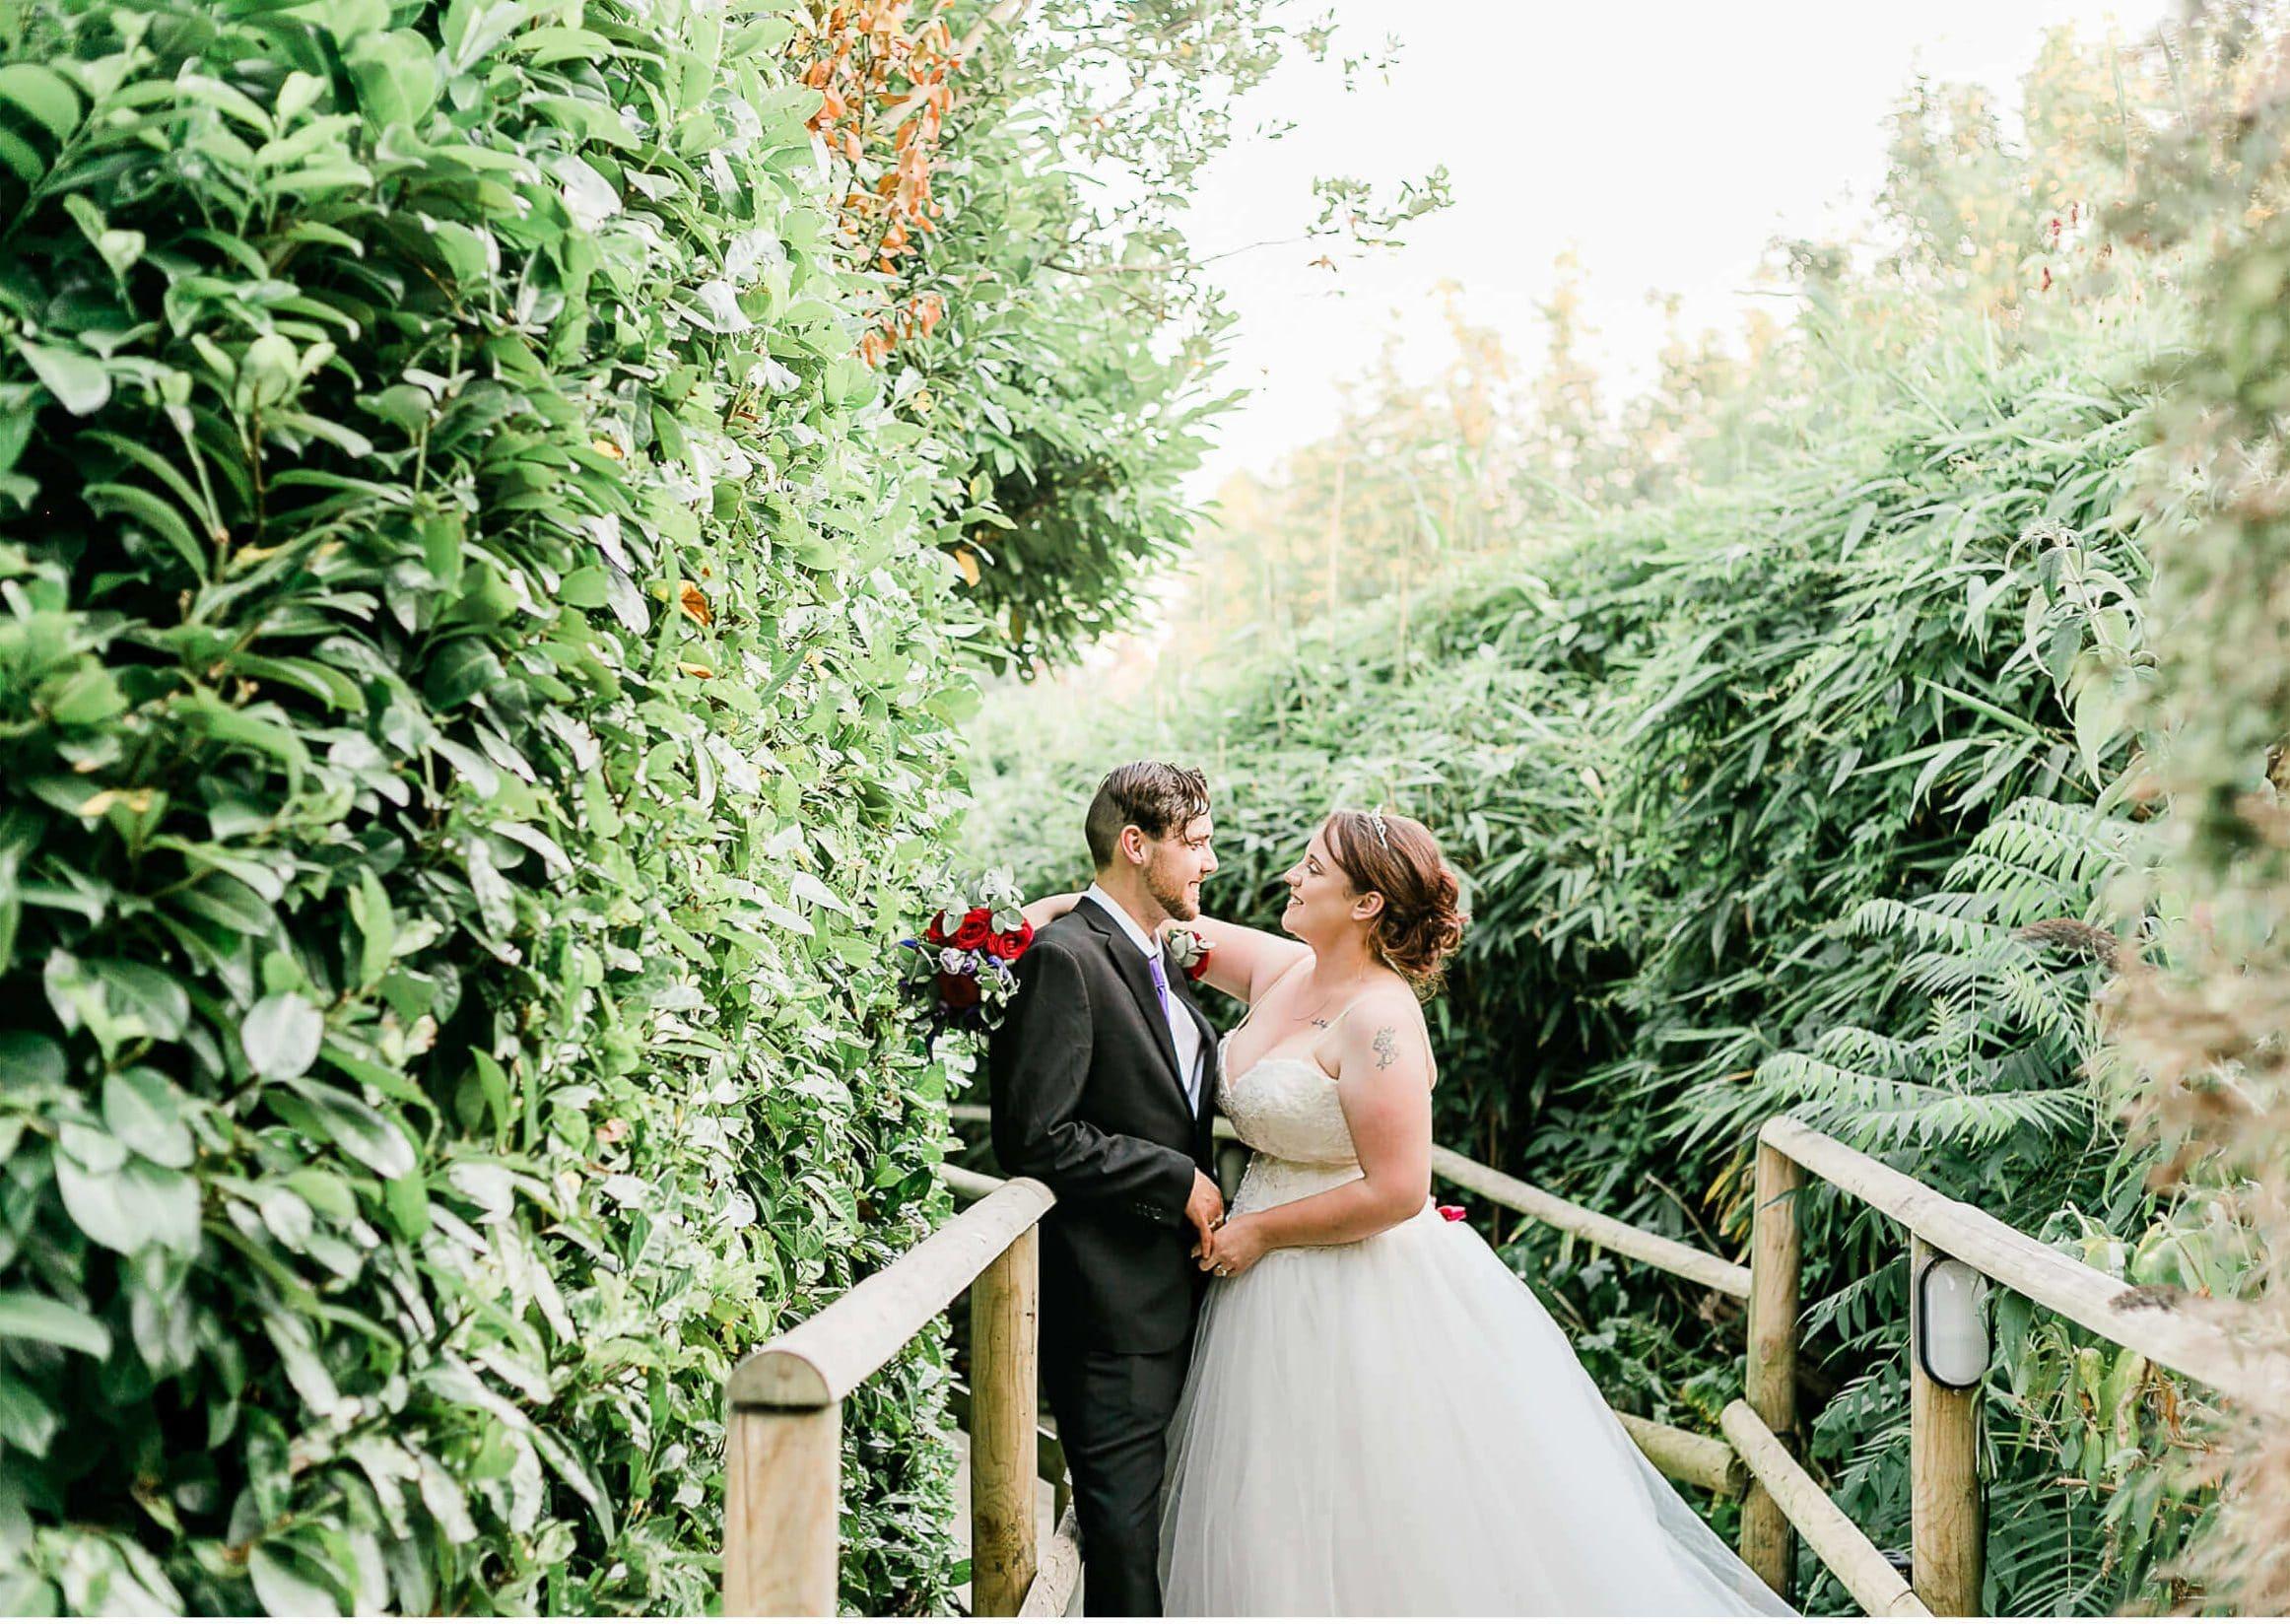 Pelham House Gardens Wedding Couple Portraits   Lewes Wedding Photographer